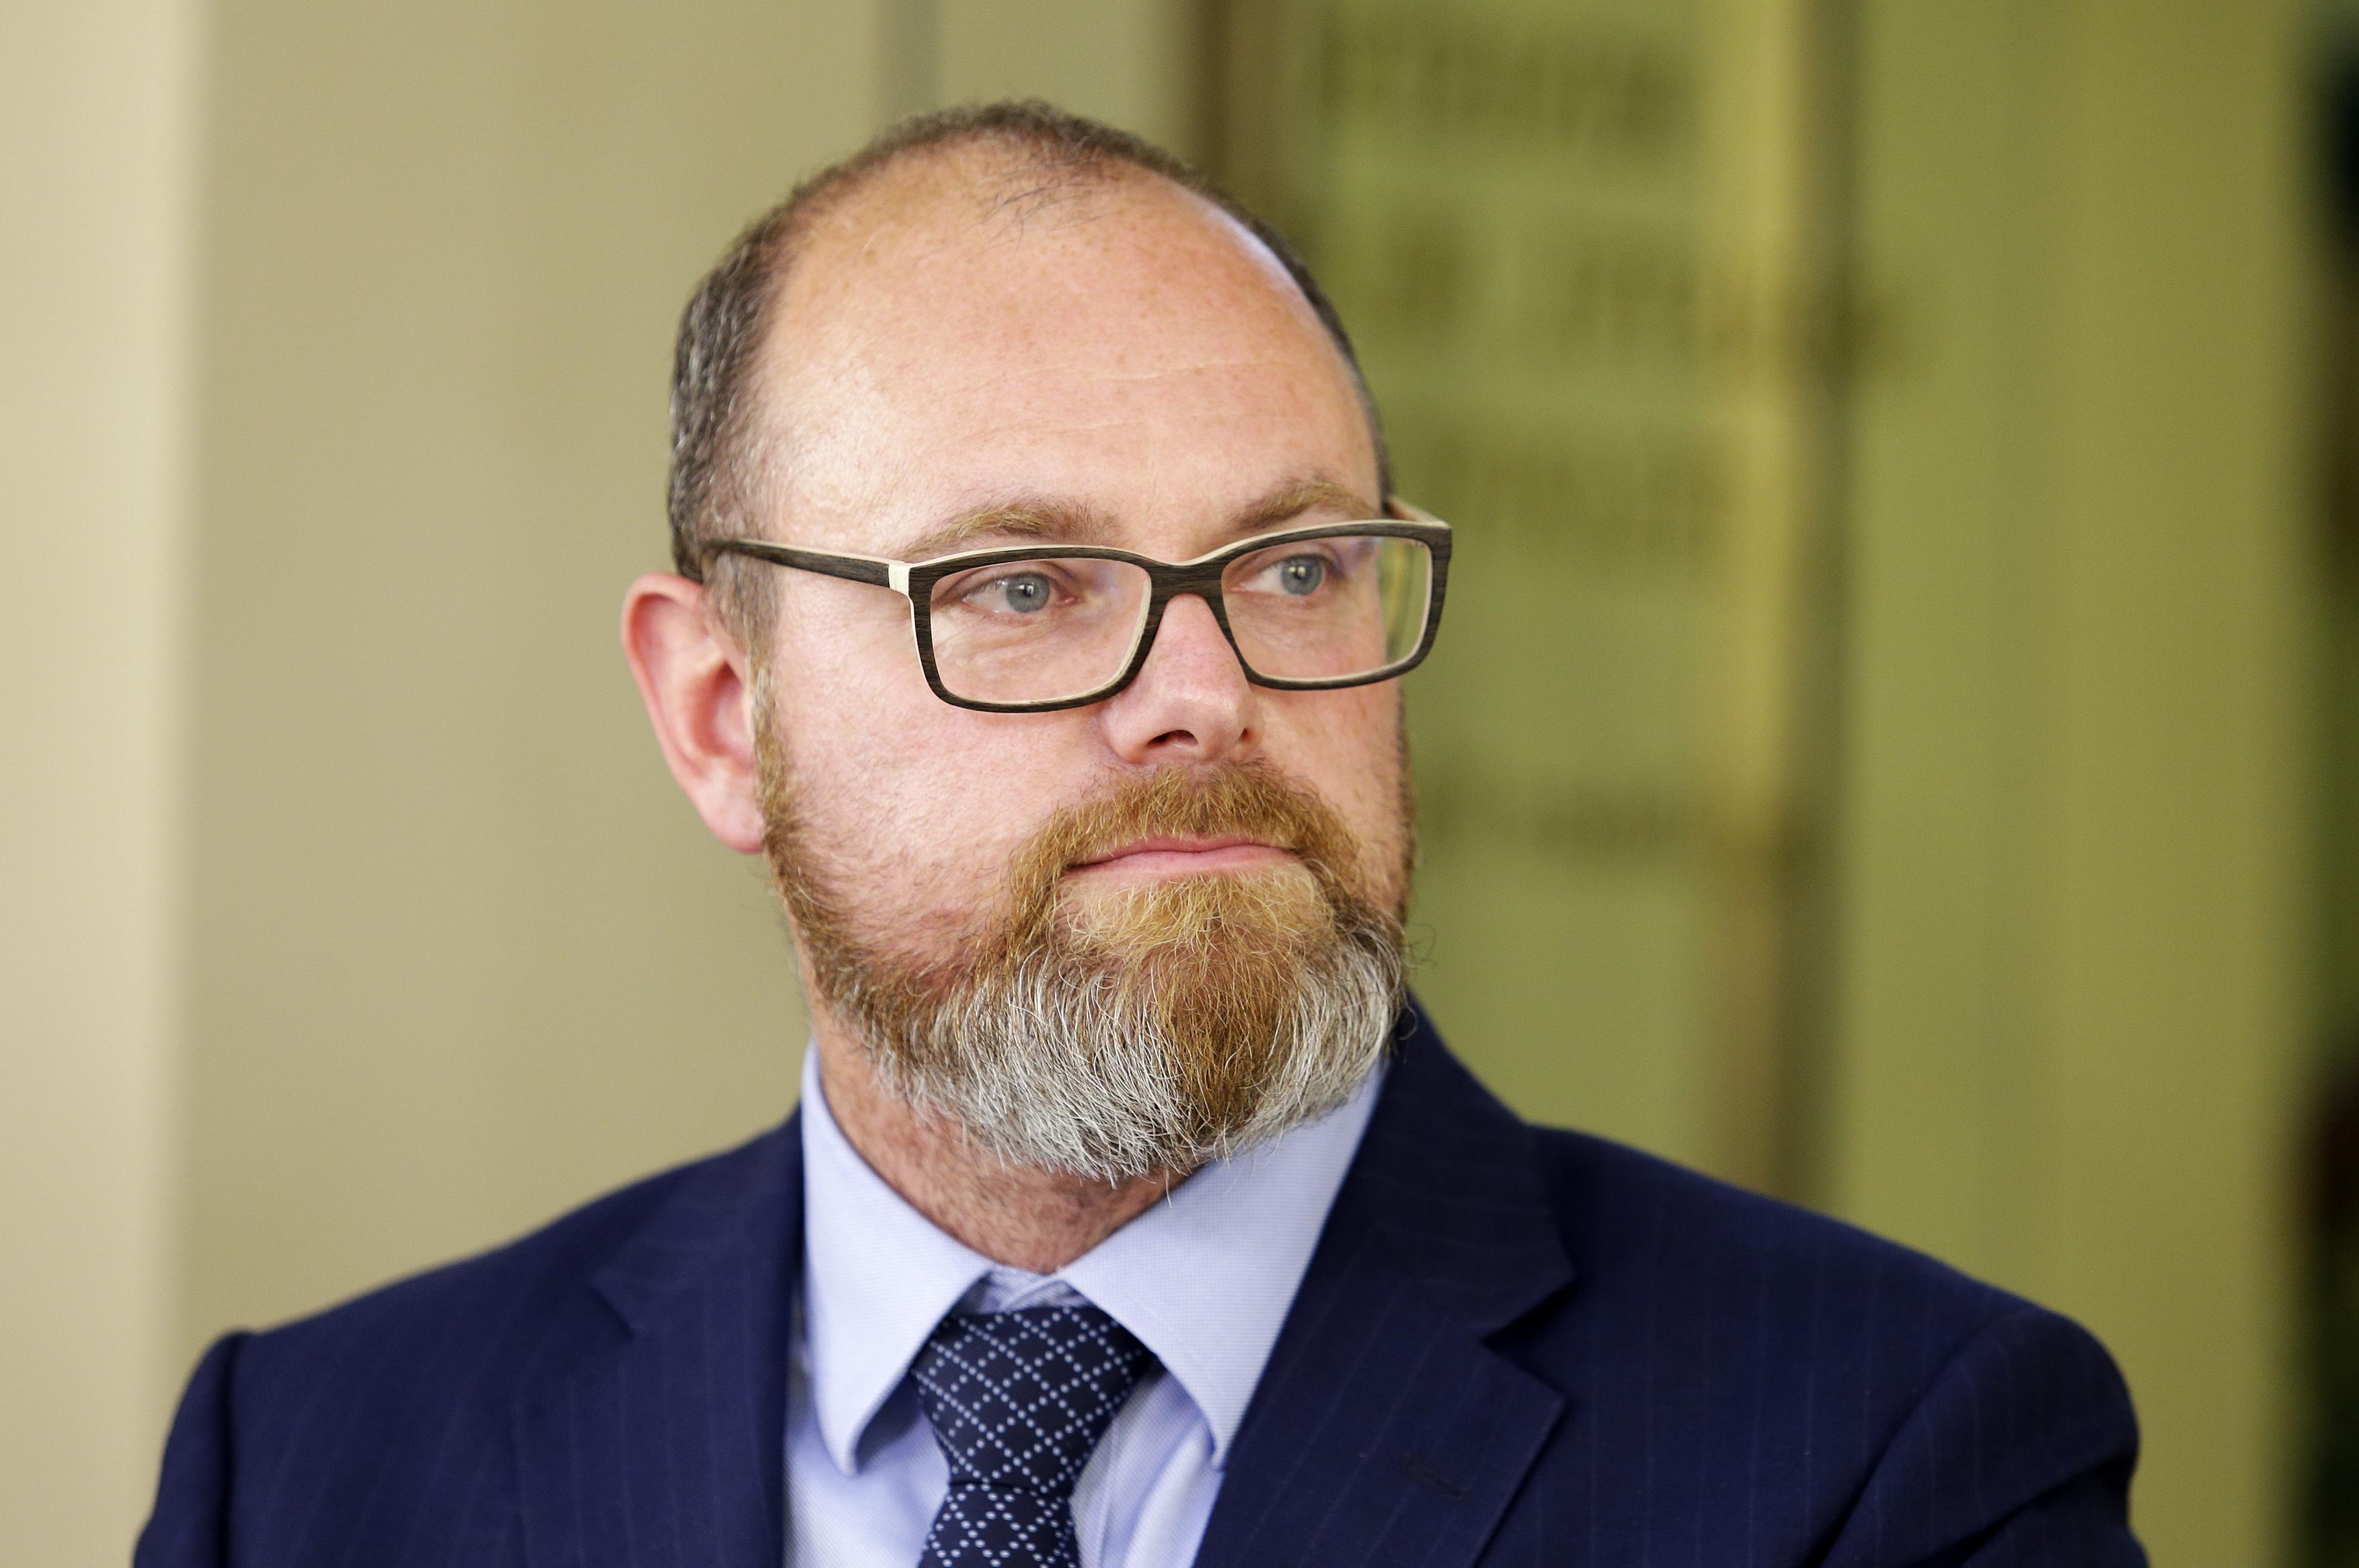 Ministr školství Robert Plaga z ANO